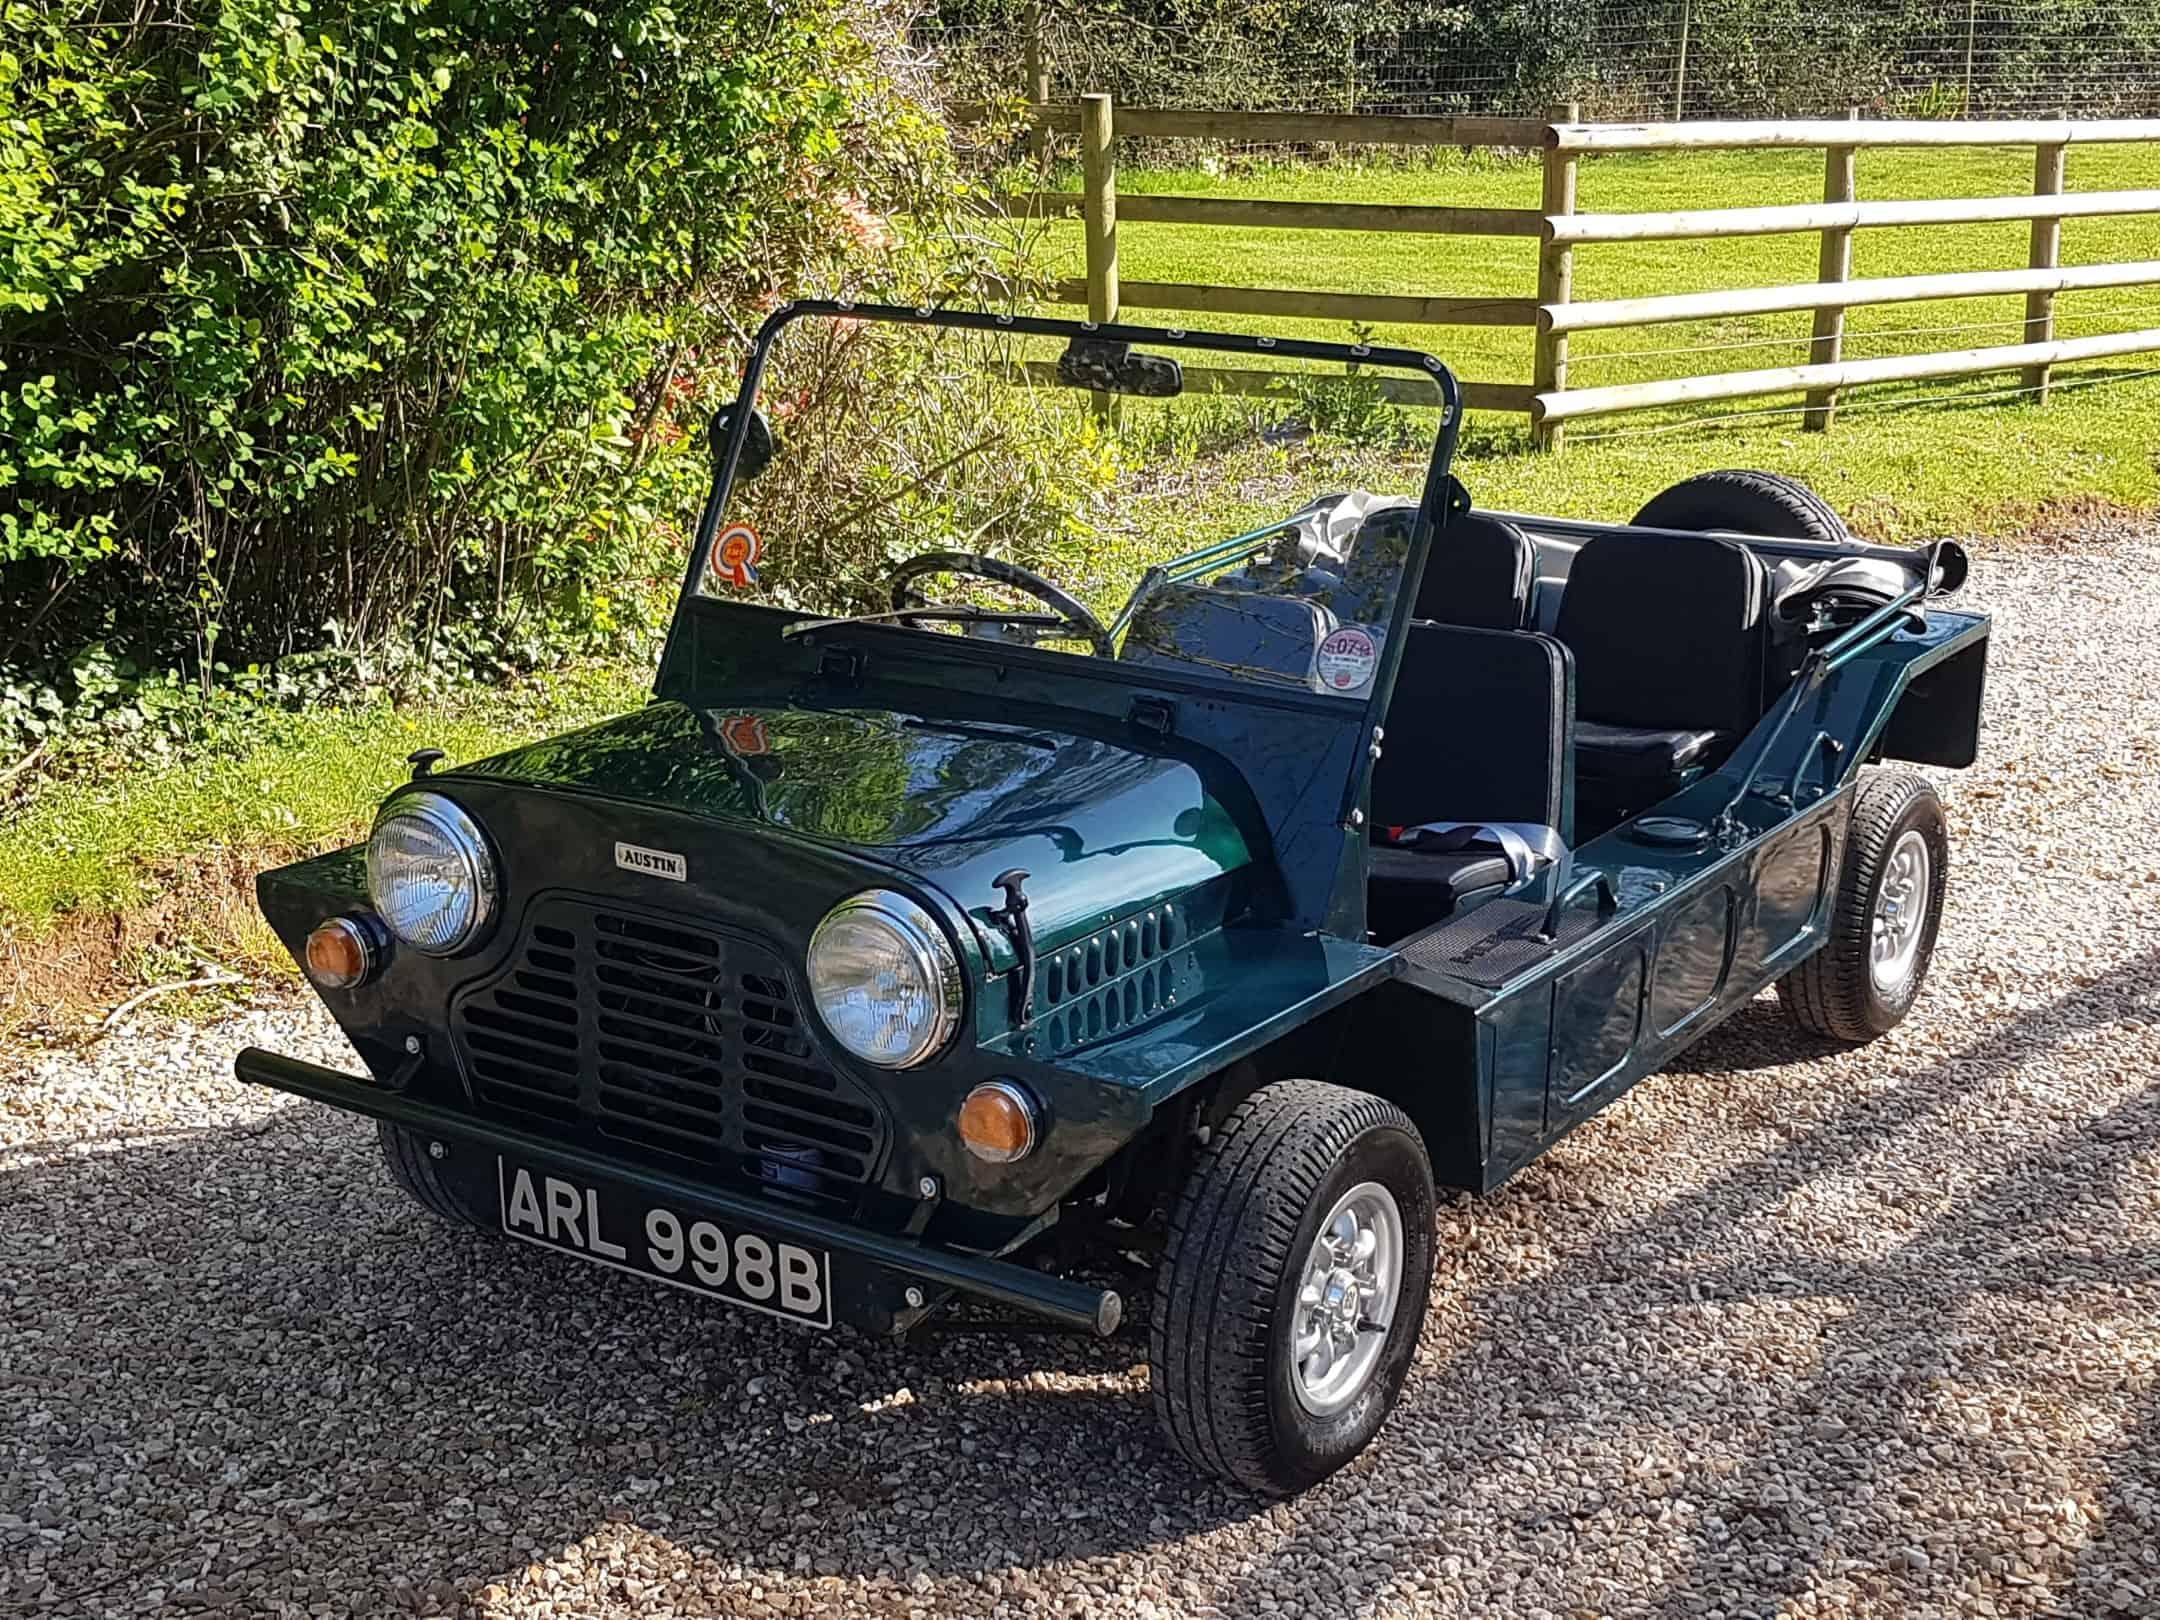 ** NOW SOLD  ** Very Early 1964 B Austin Mini Moke